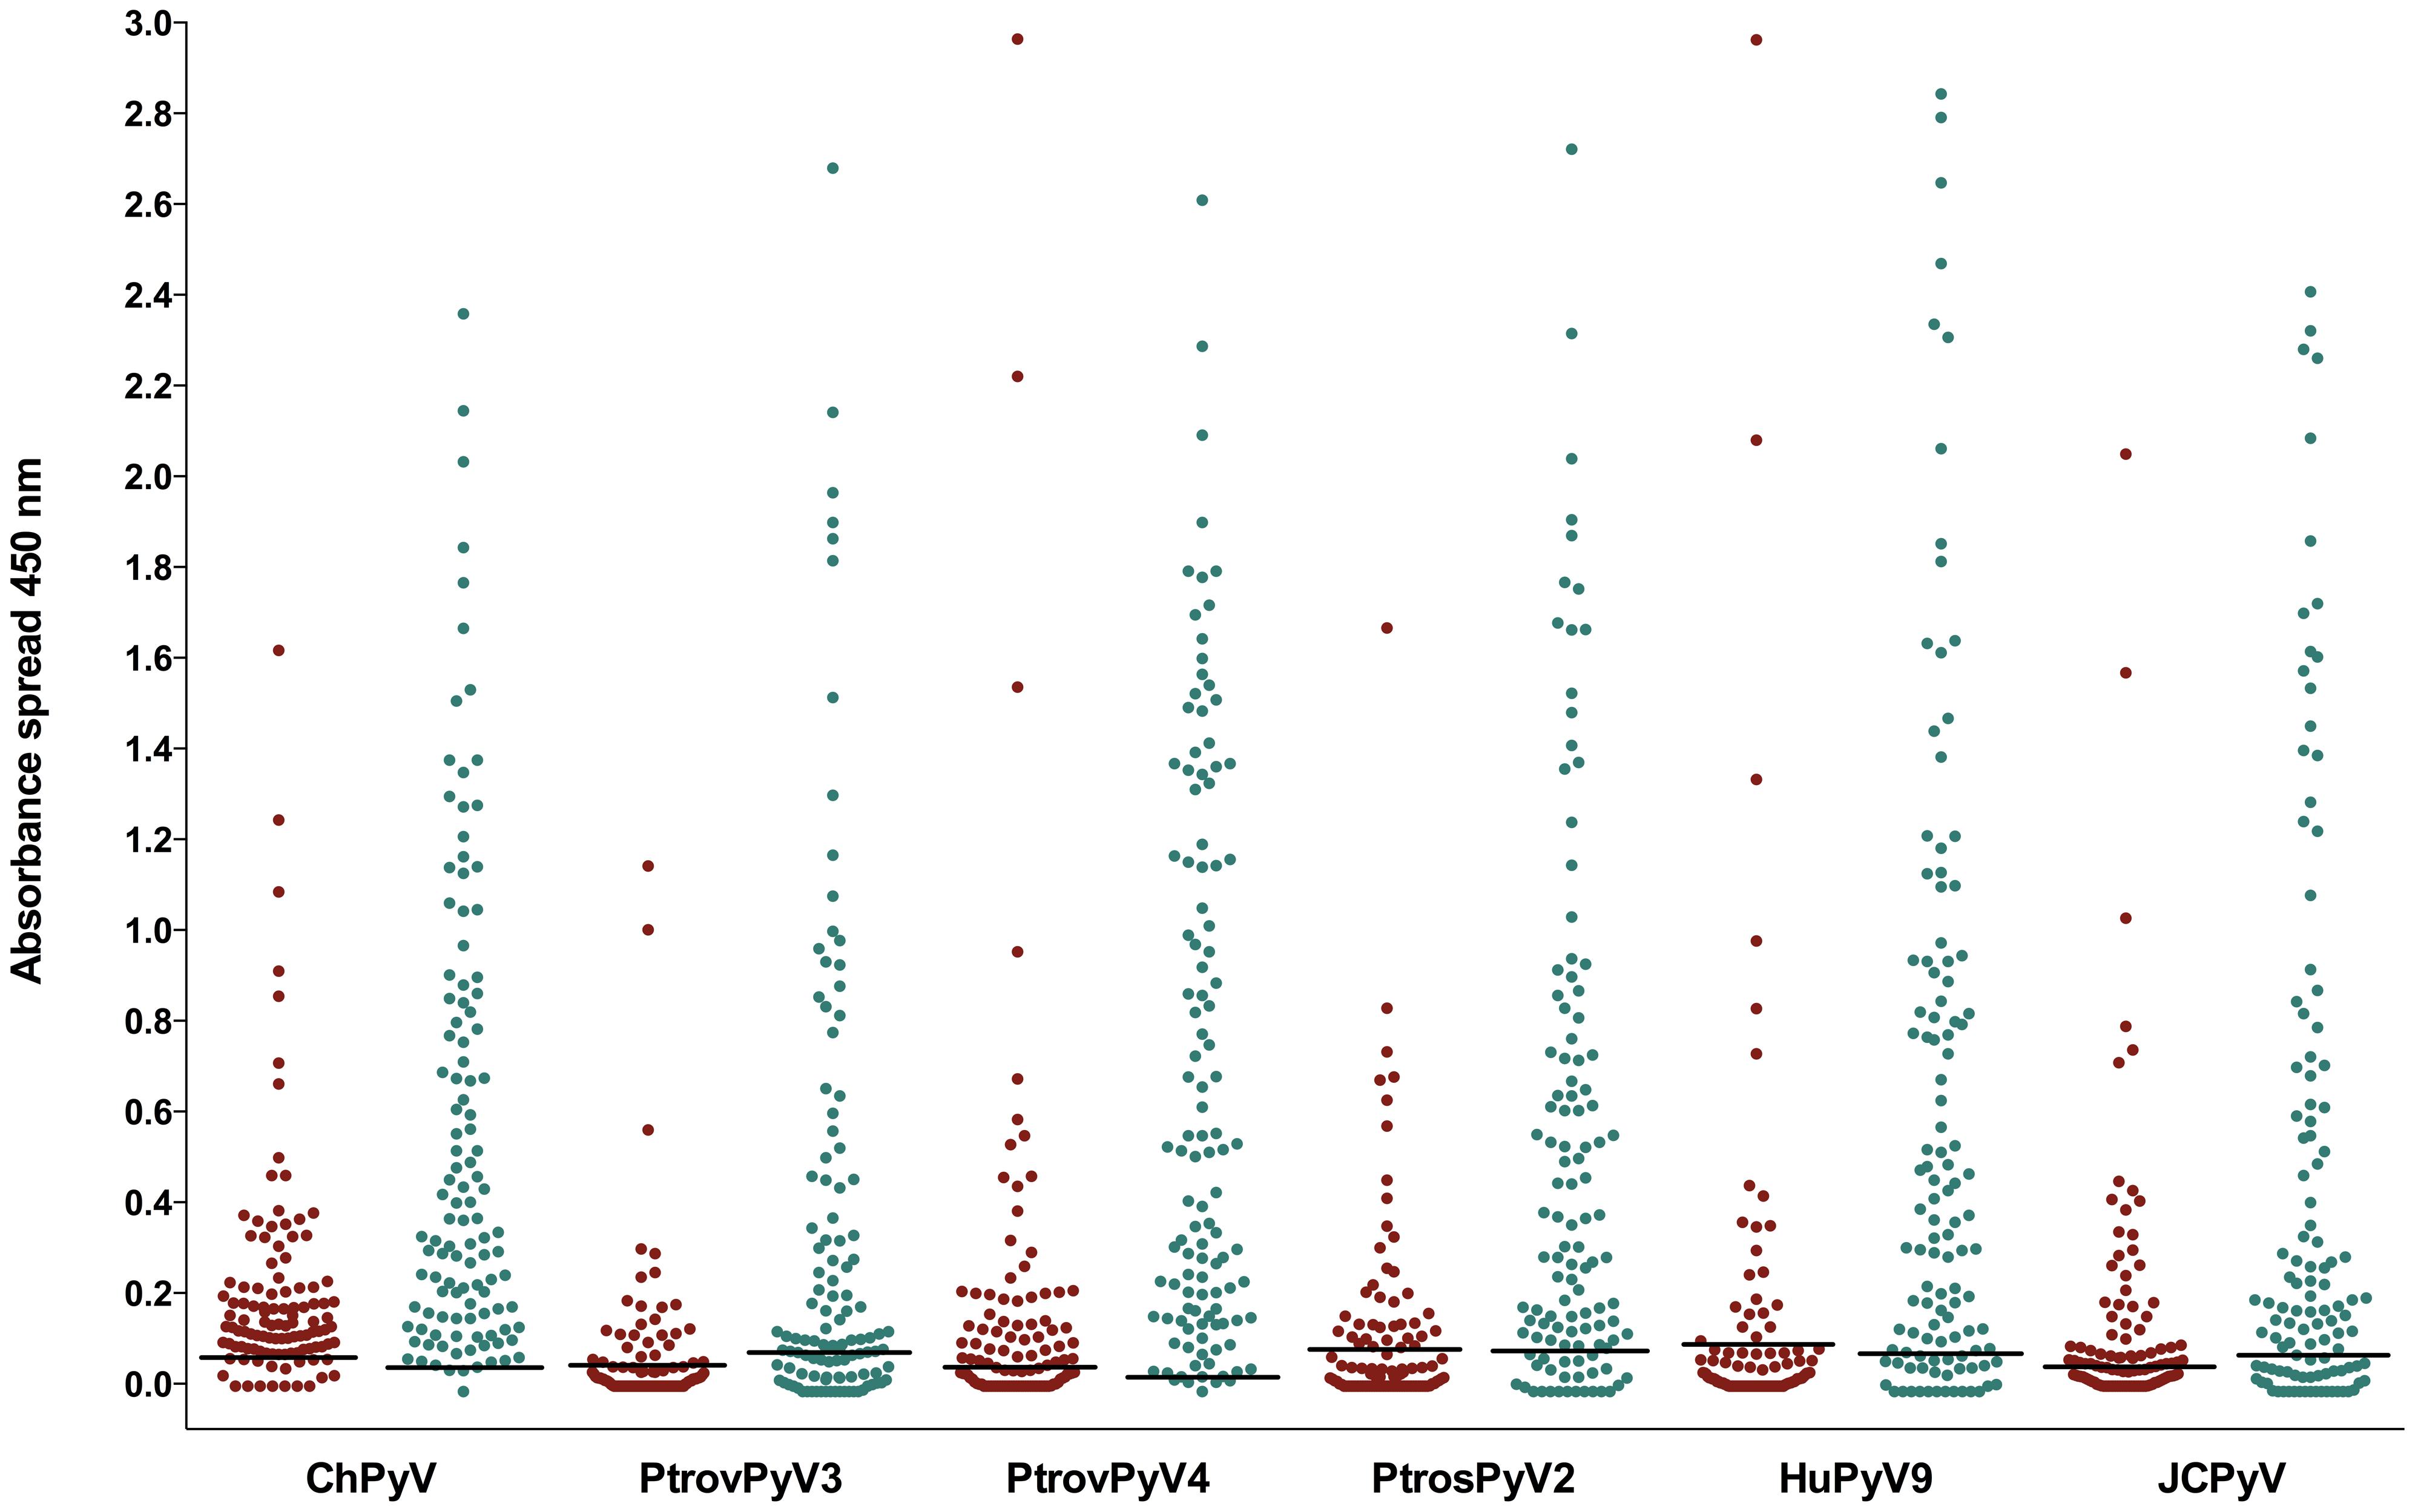 Reactivity of human sera to VP1 proteins of chimpanzee and human polyomaviruses.